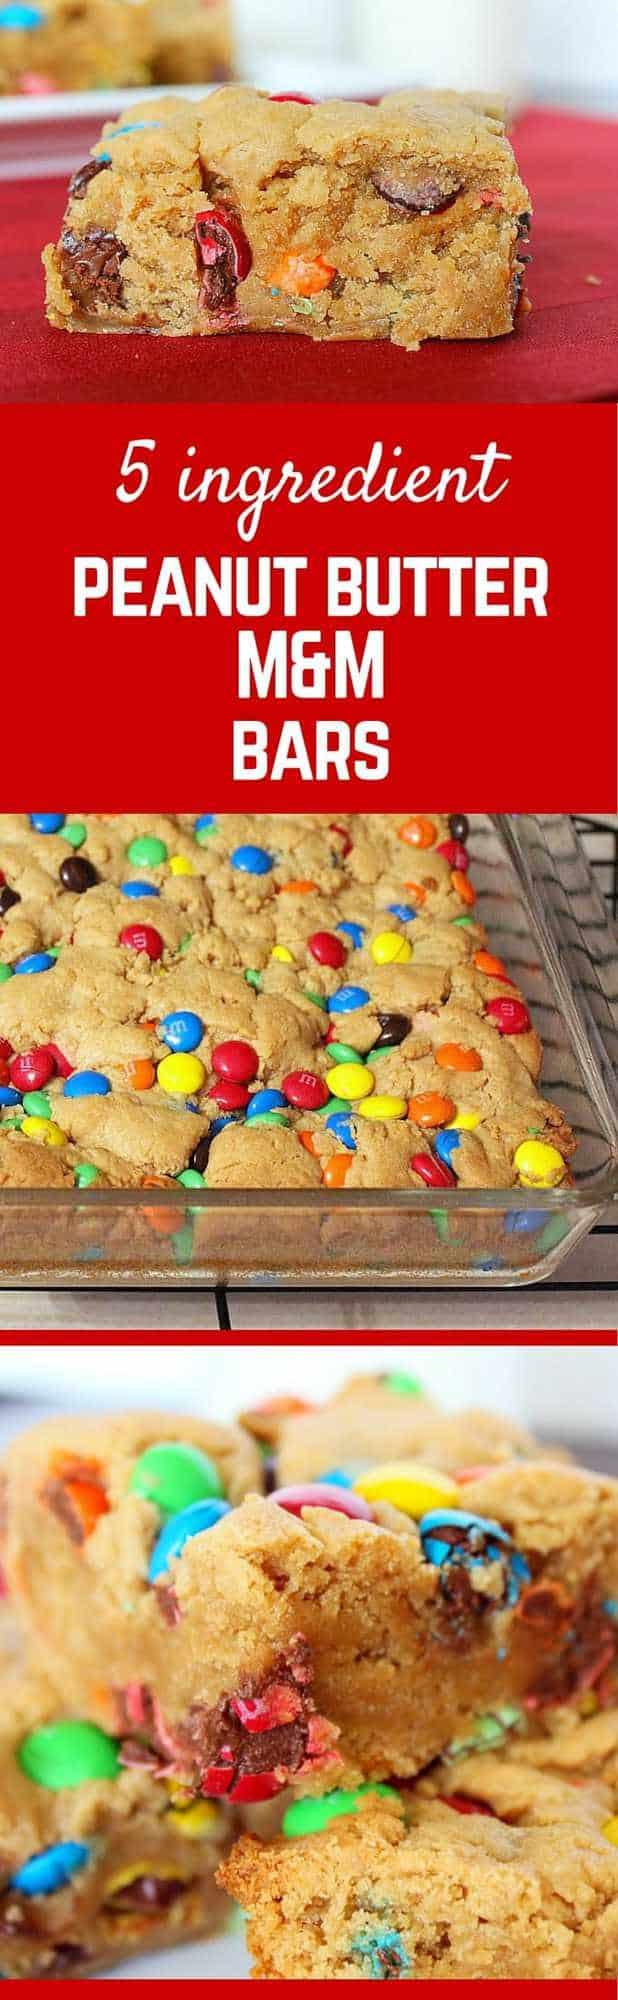 5 Ingredient M M Peanut Butter Bars Rachel Cooks